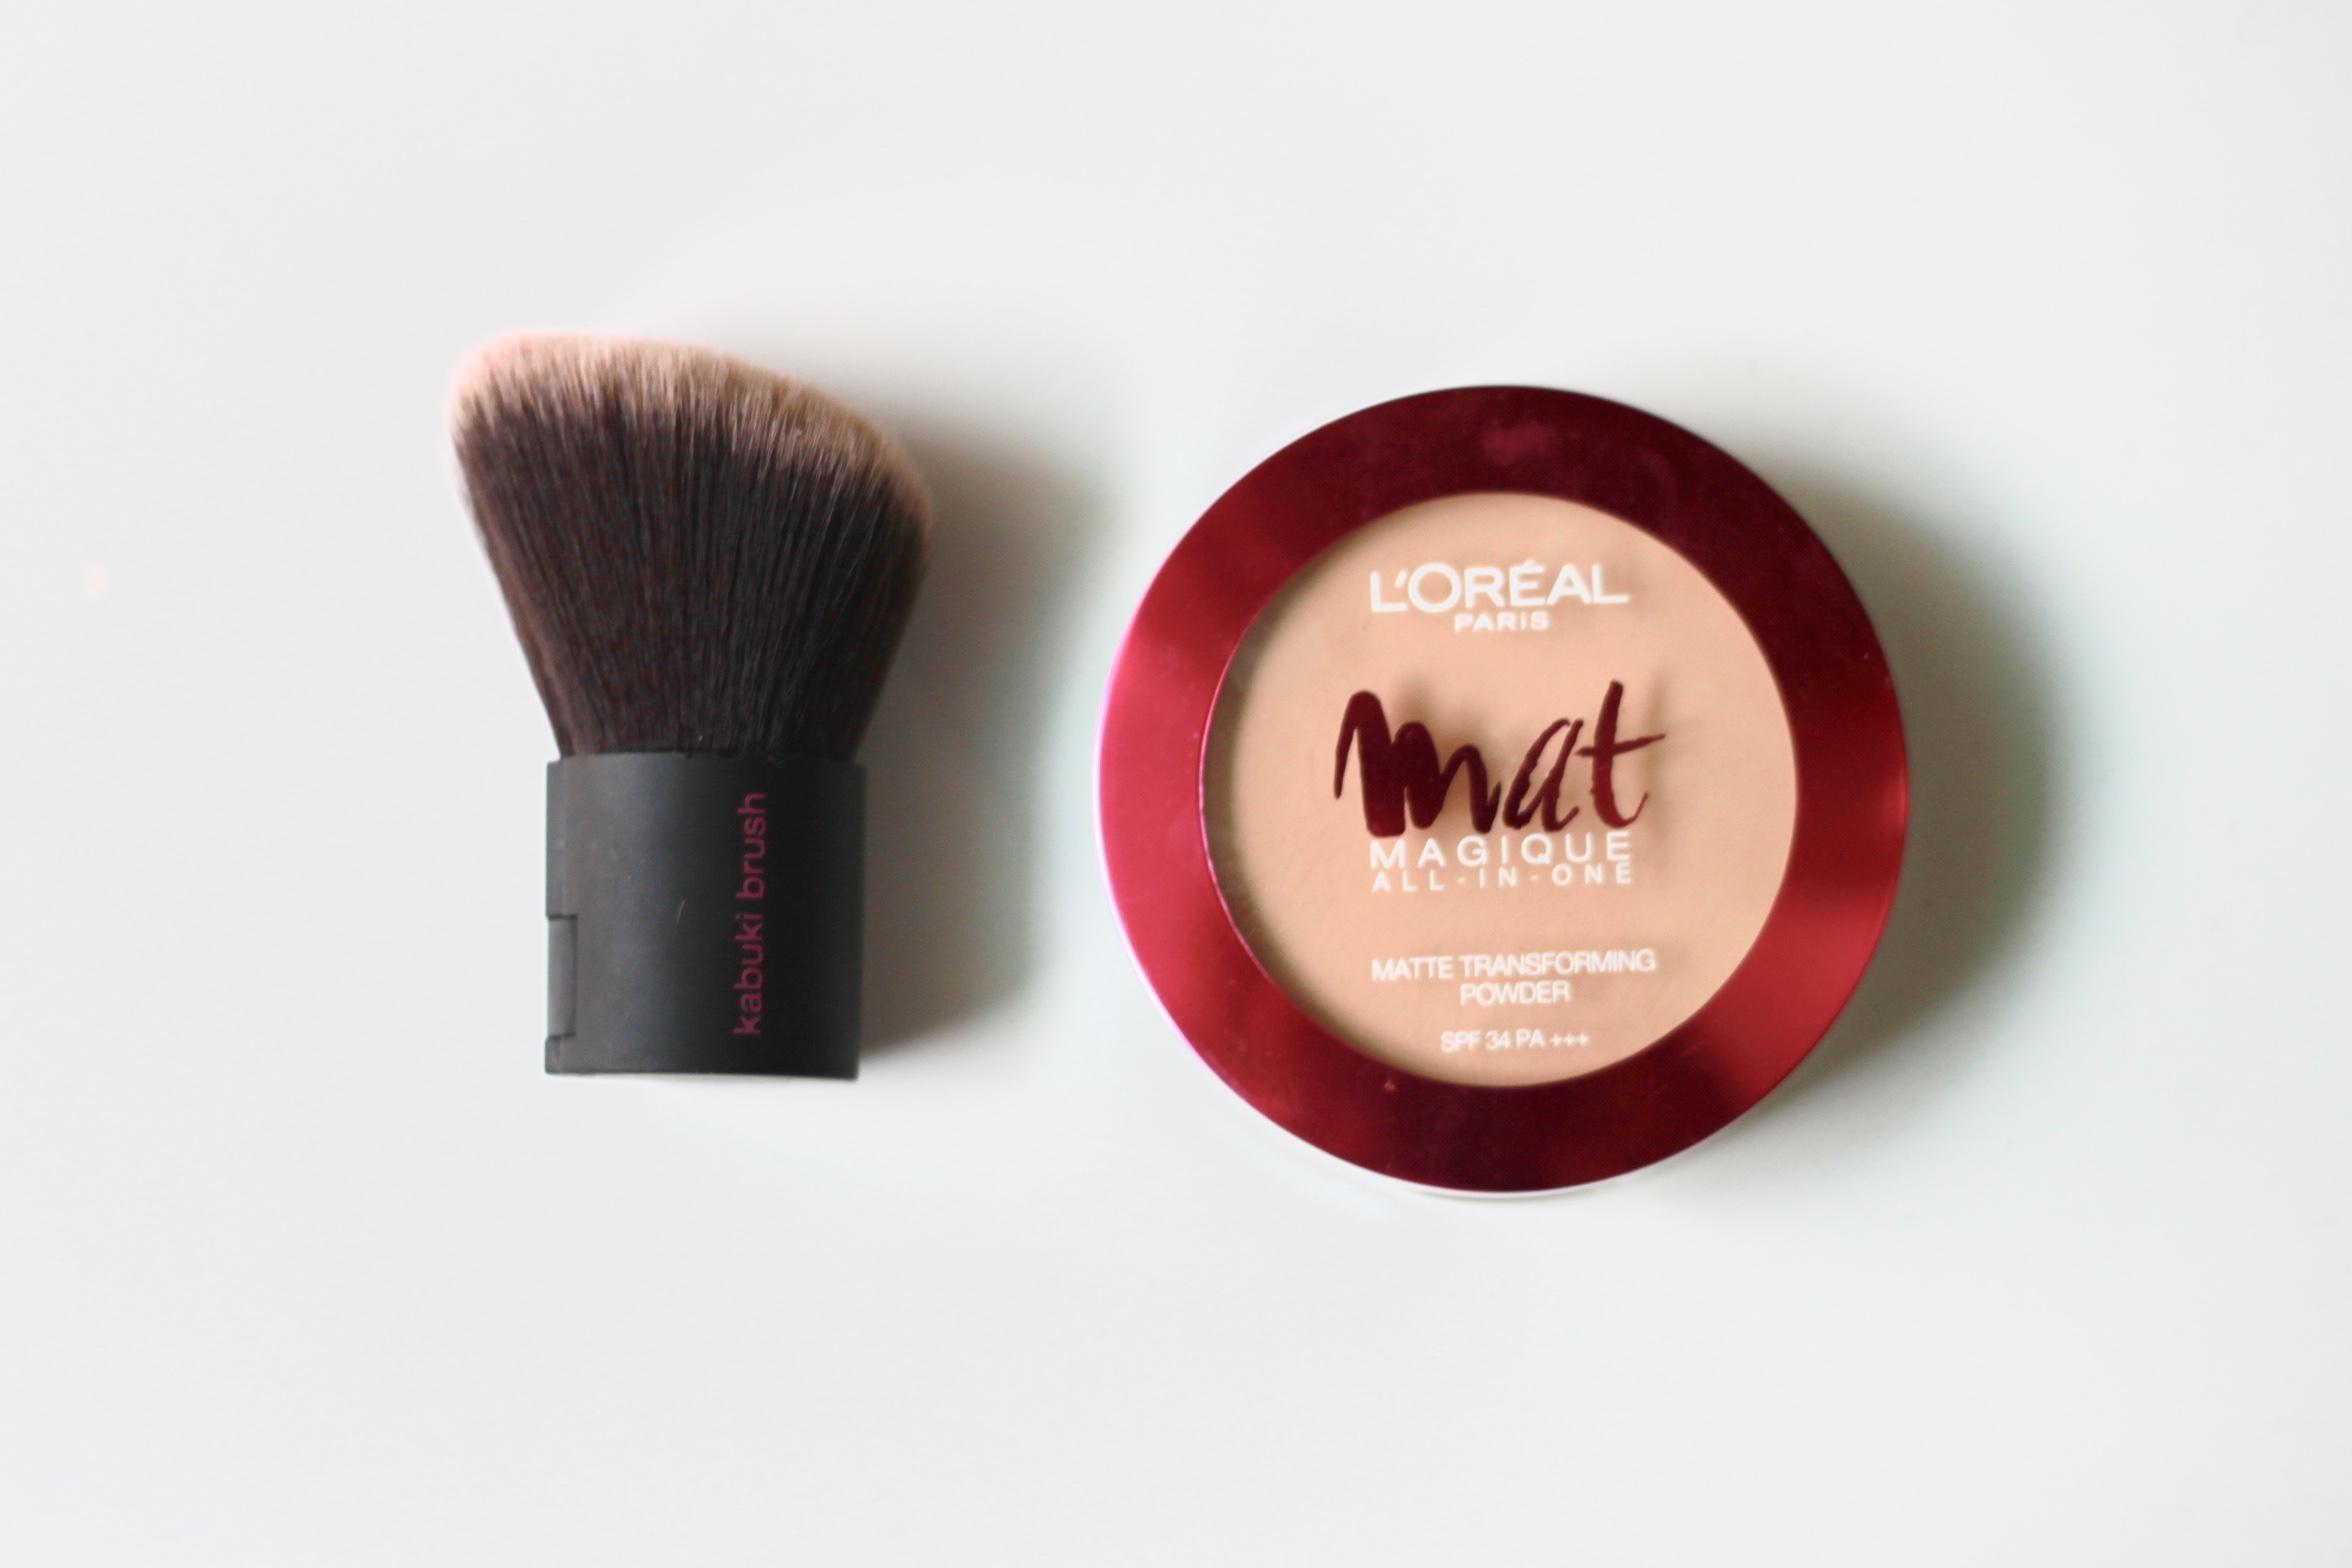 Loreal Mat Magique compact powder, loreal compact, loreal powder, loreal mat magique, real techniques, real techniques kabuki brush